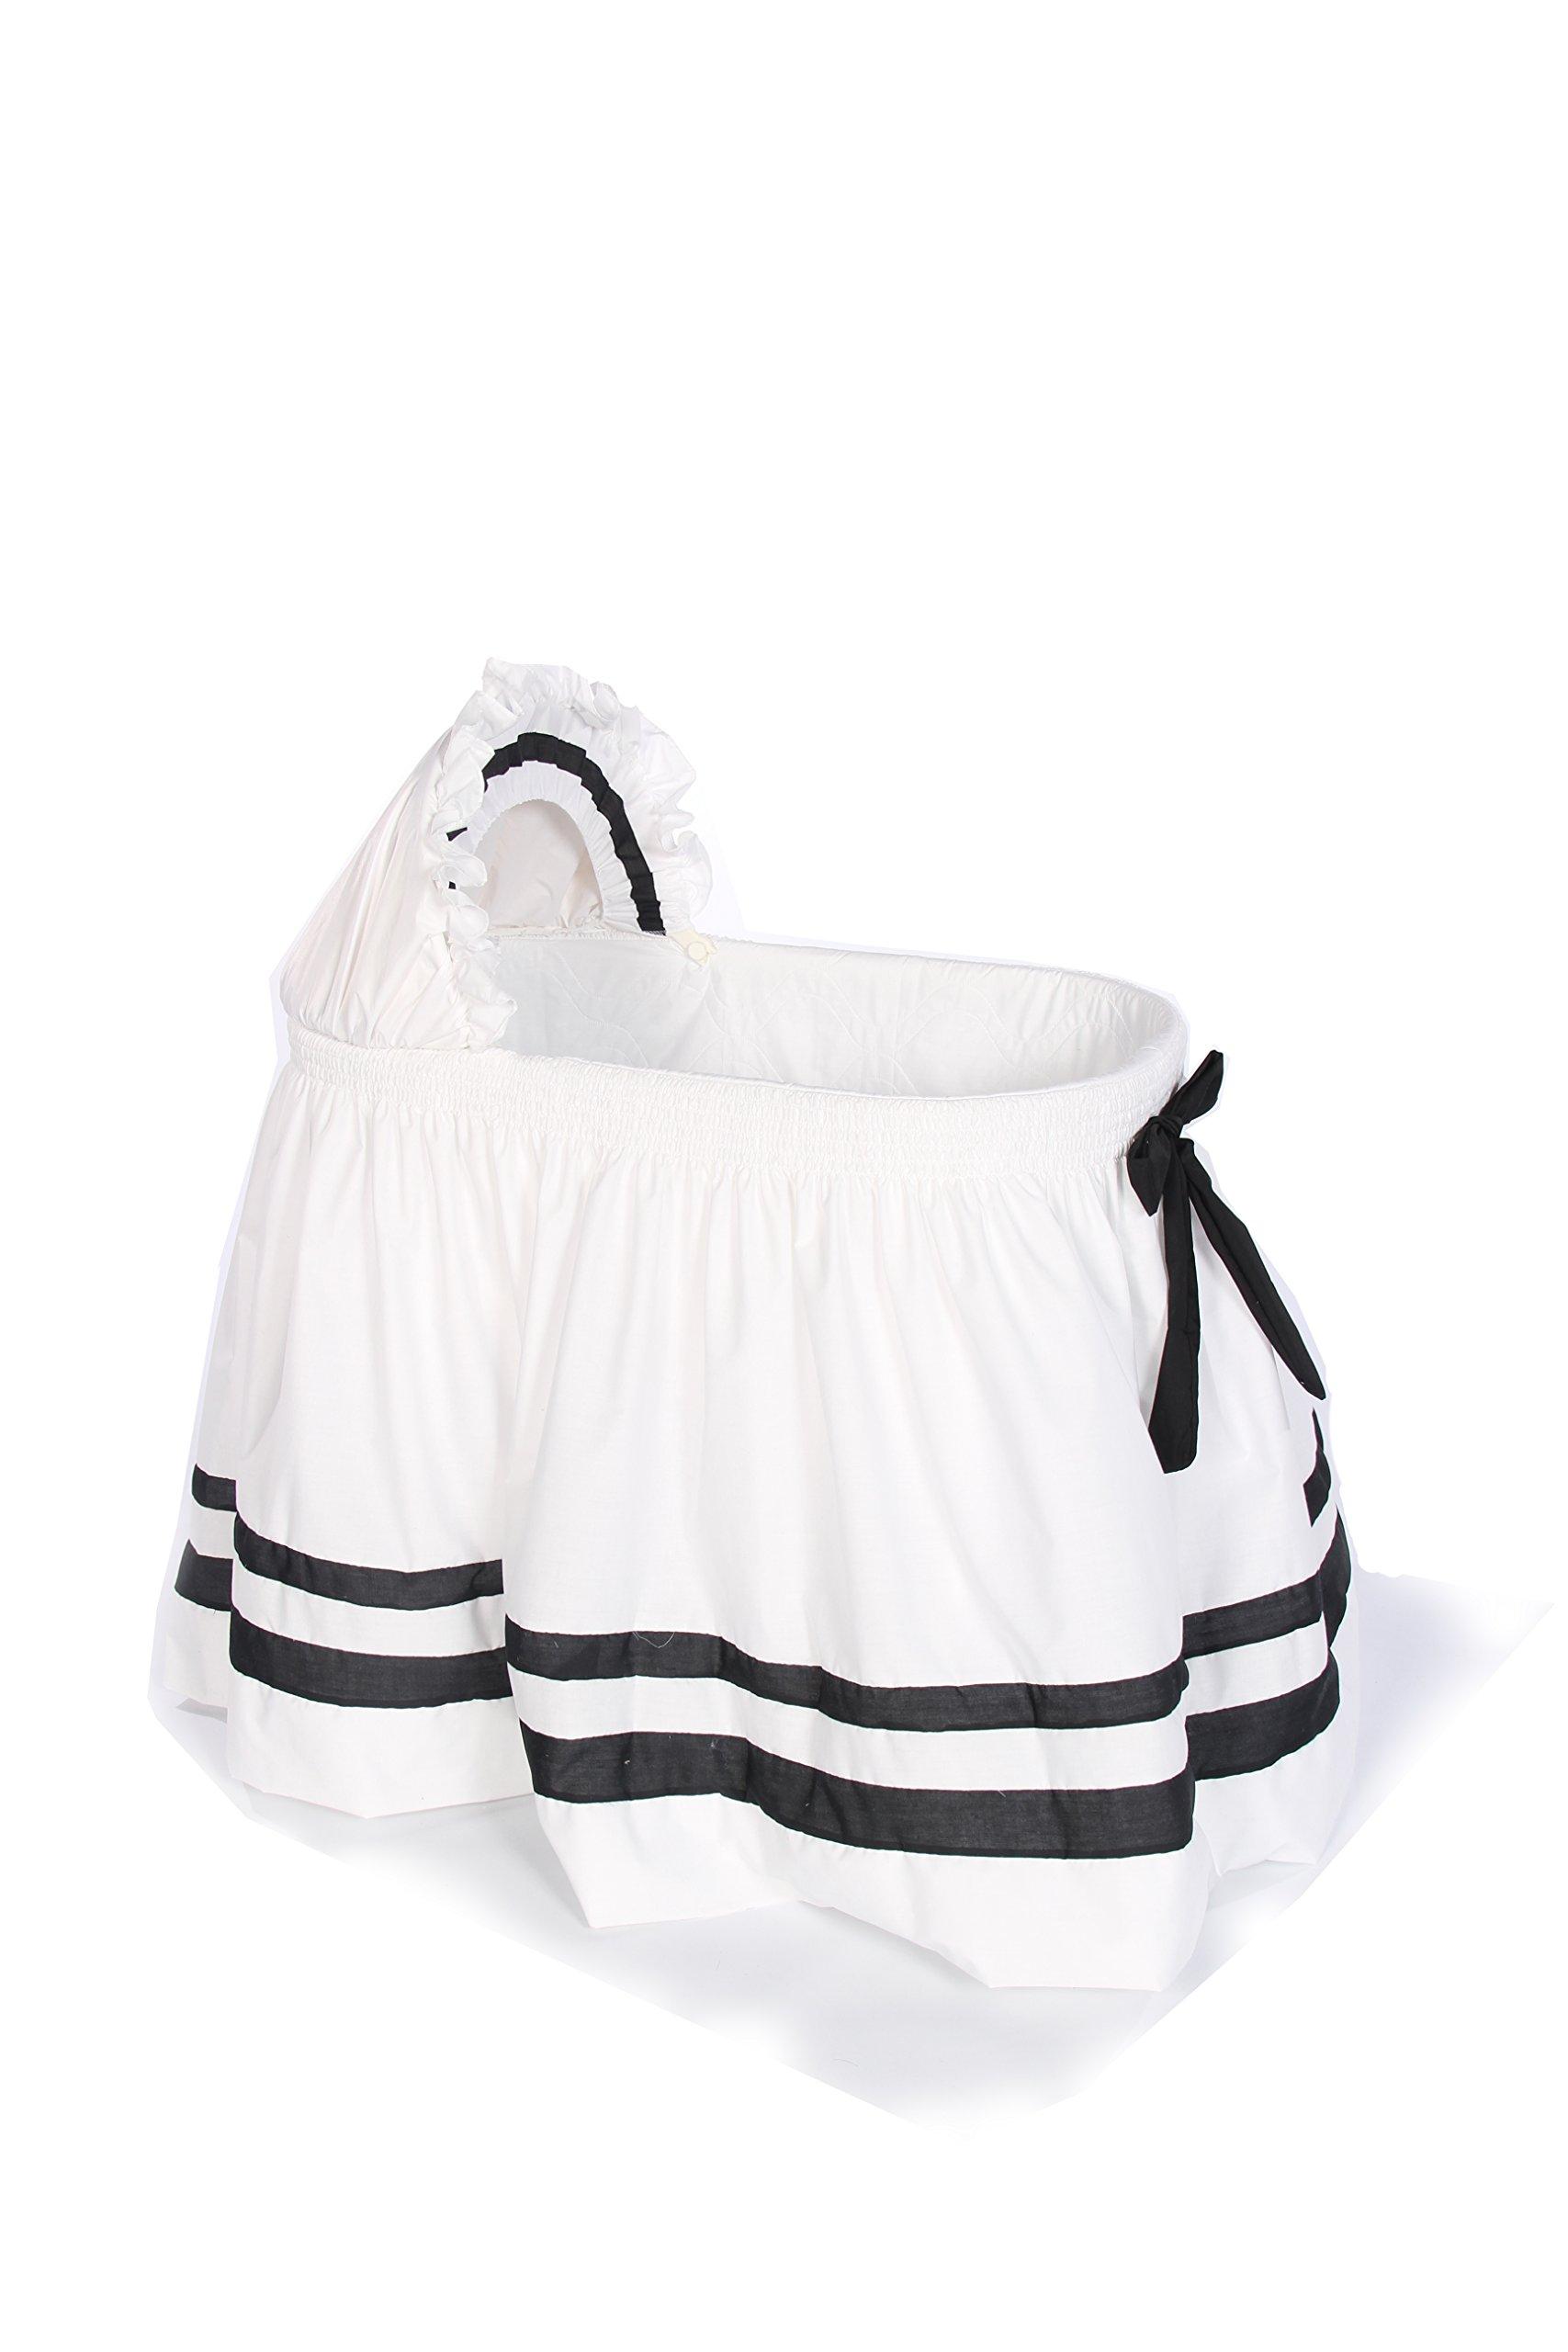 Baby Doll Bedding Modern Hotel Style II Bassinet Skirt, Black